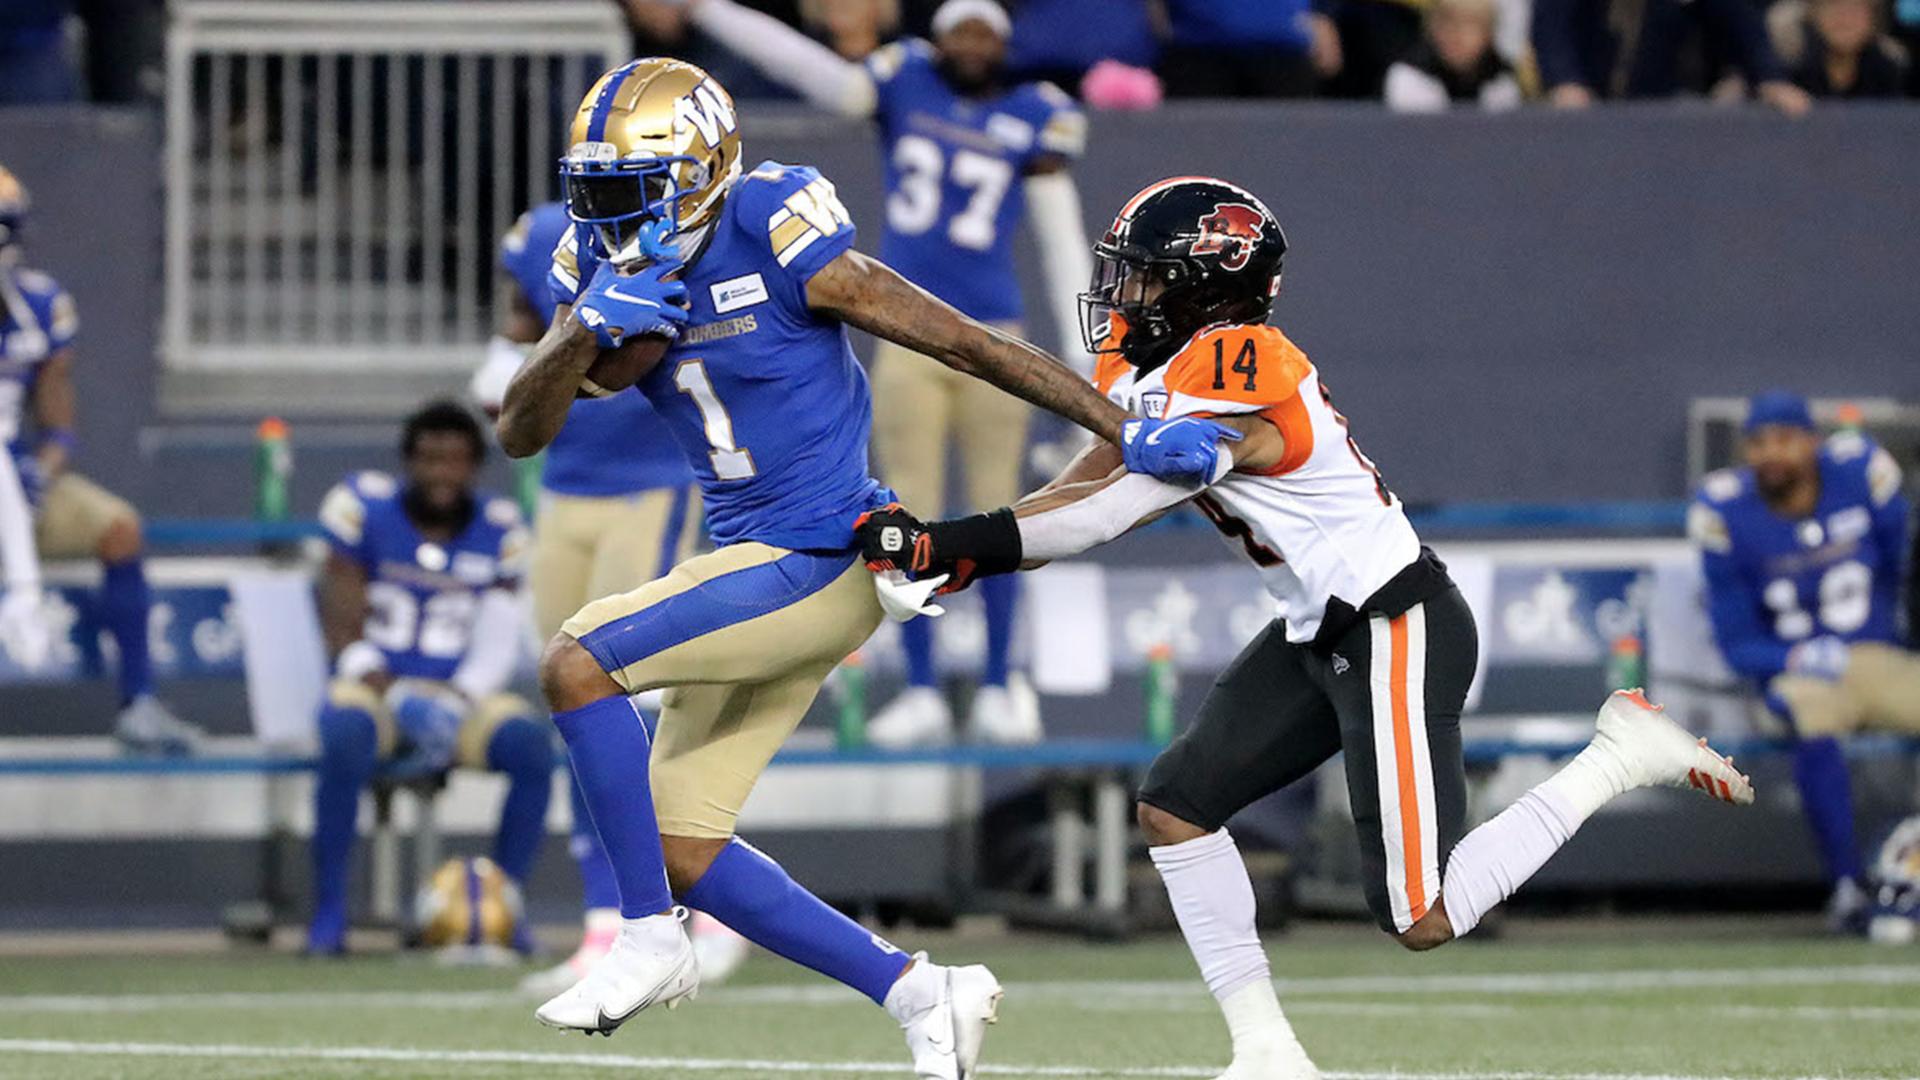 Week 12 Highlights | Winnipeg 45, BC 0